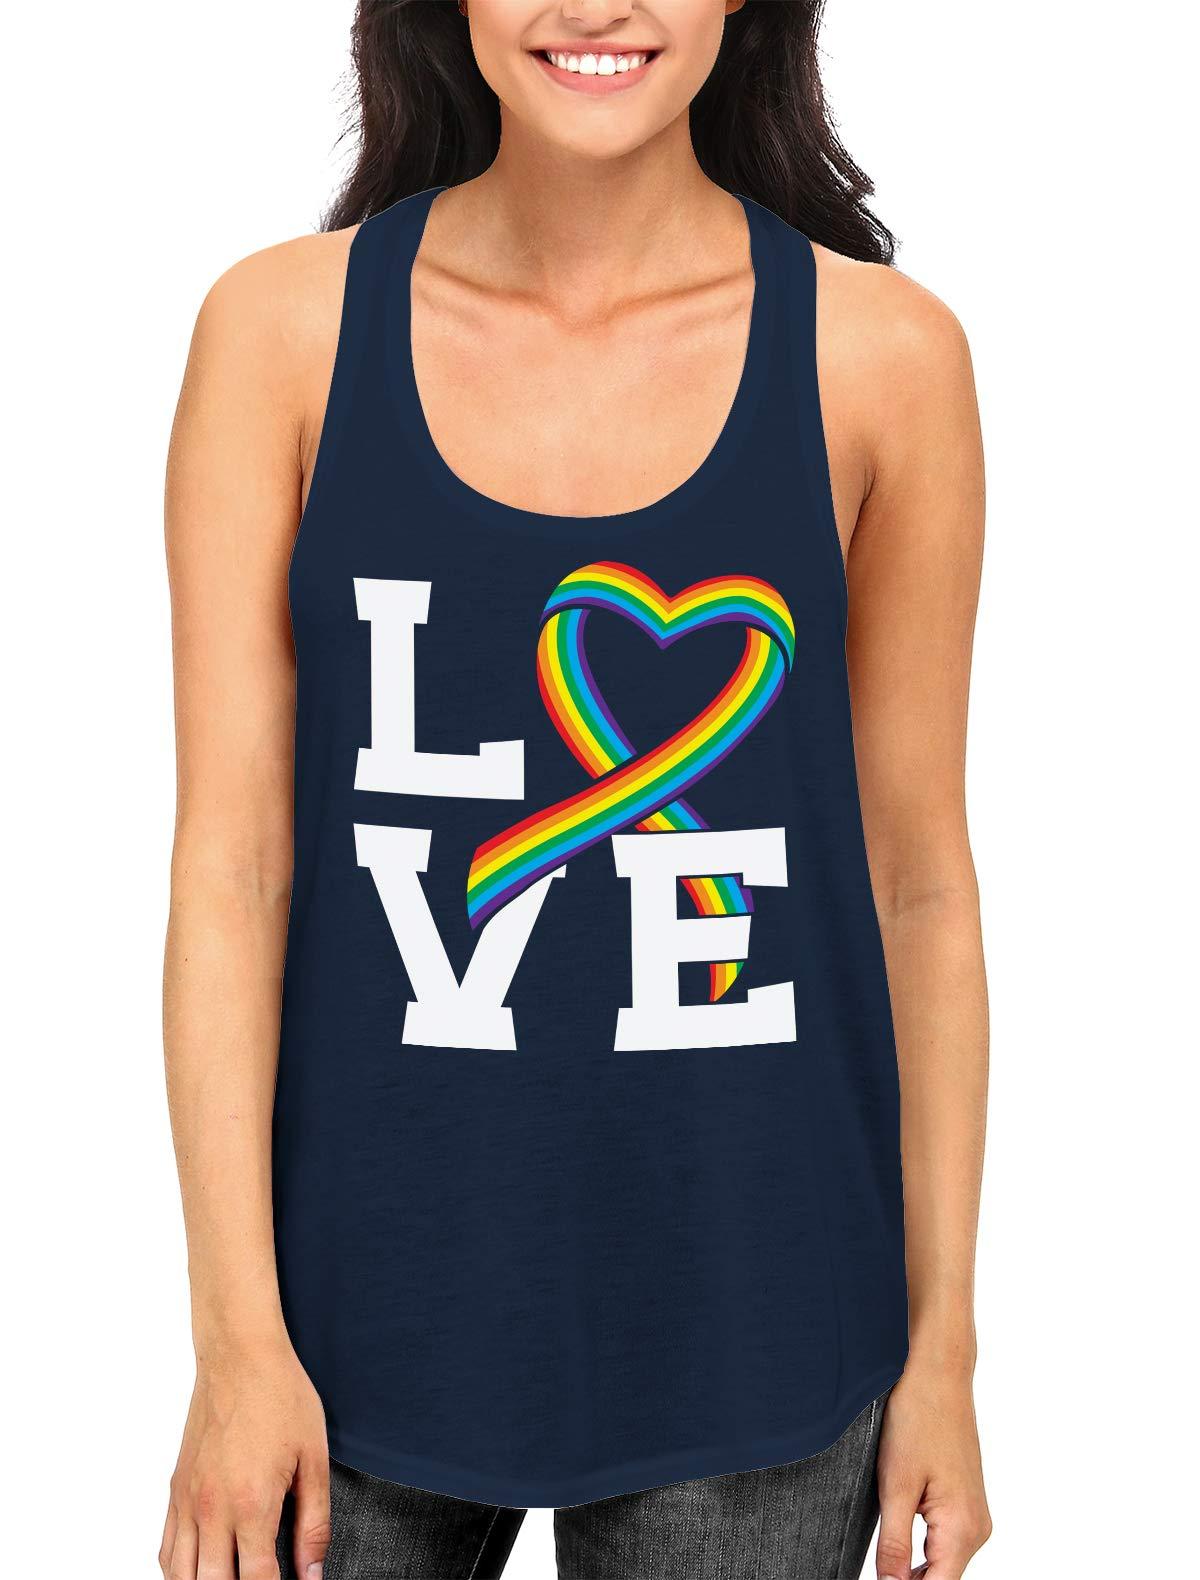 Apparel Love Rainbow Ribbon Racerback Tank Top Shirts